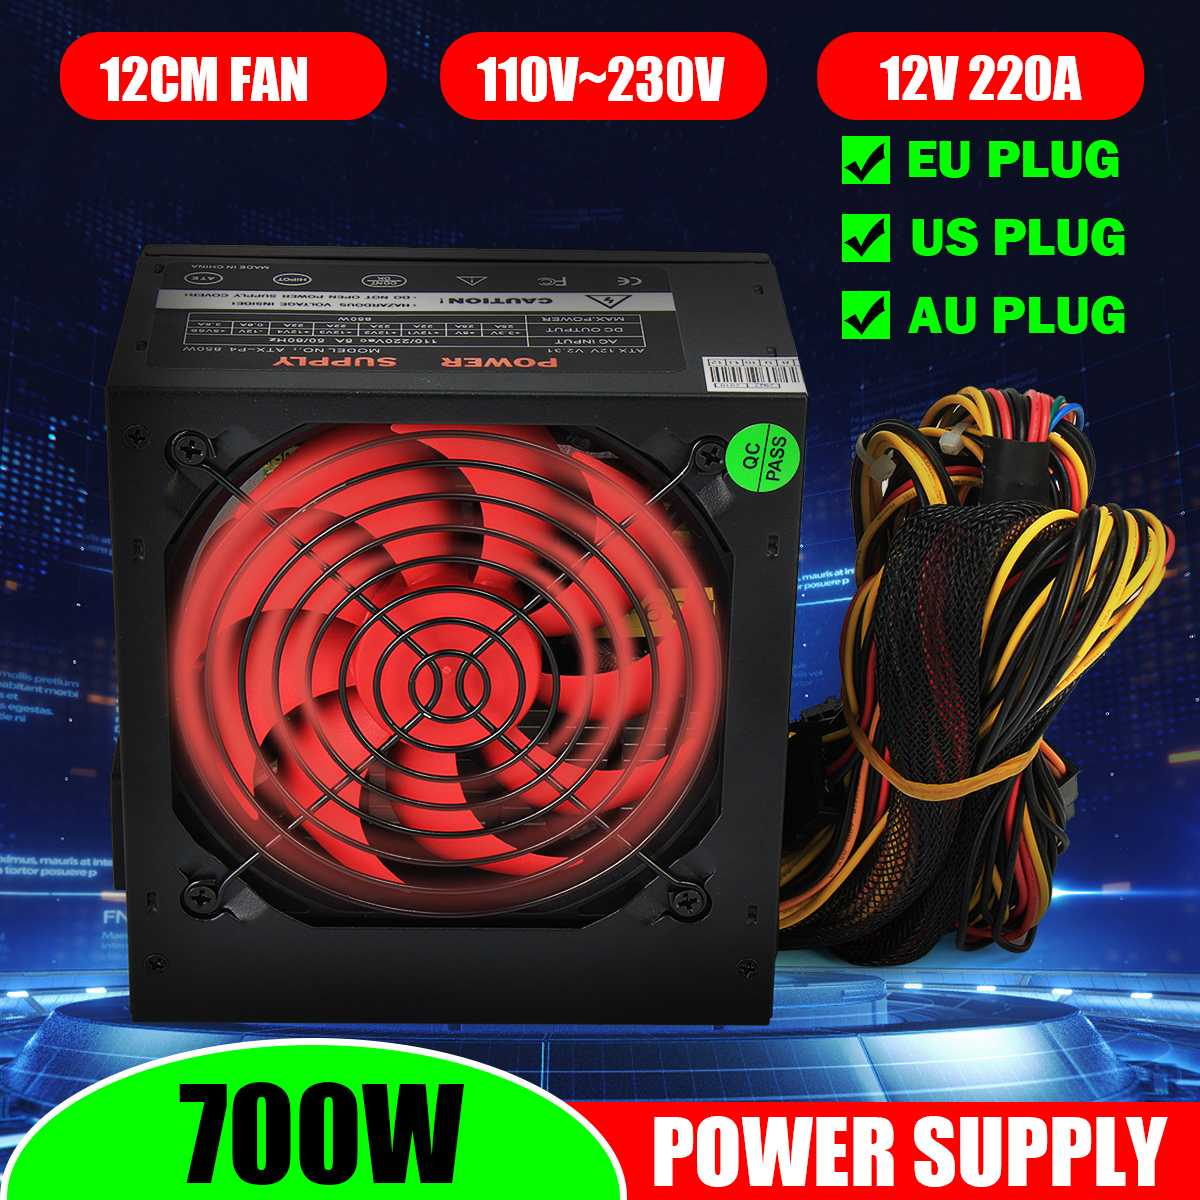 PSU PFC 700 W Watt Silent Fan ATX 24-PIN 12CM PC Computer Power Supply 80+